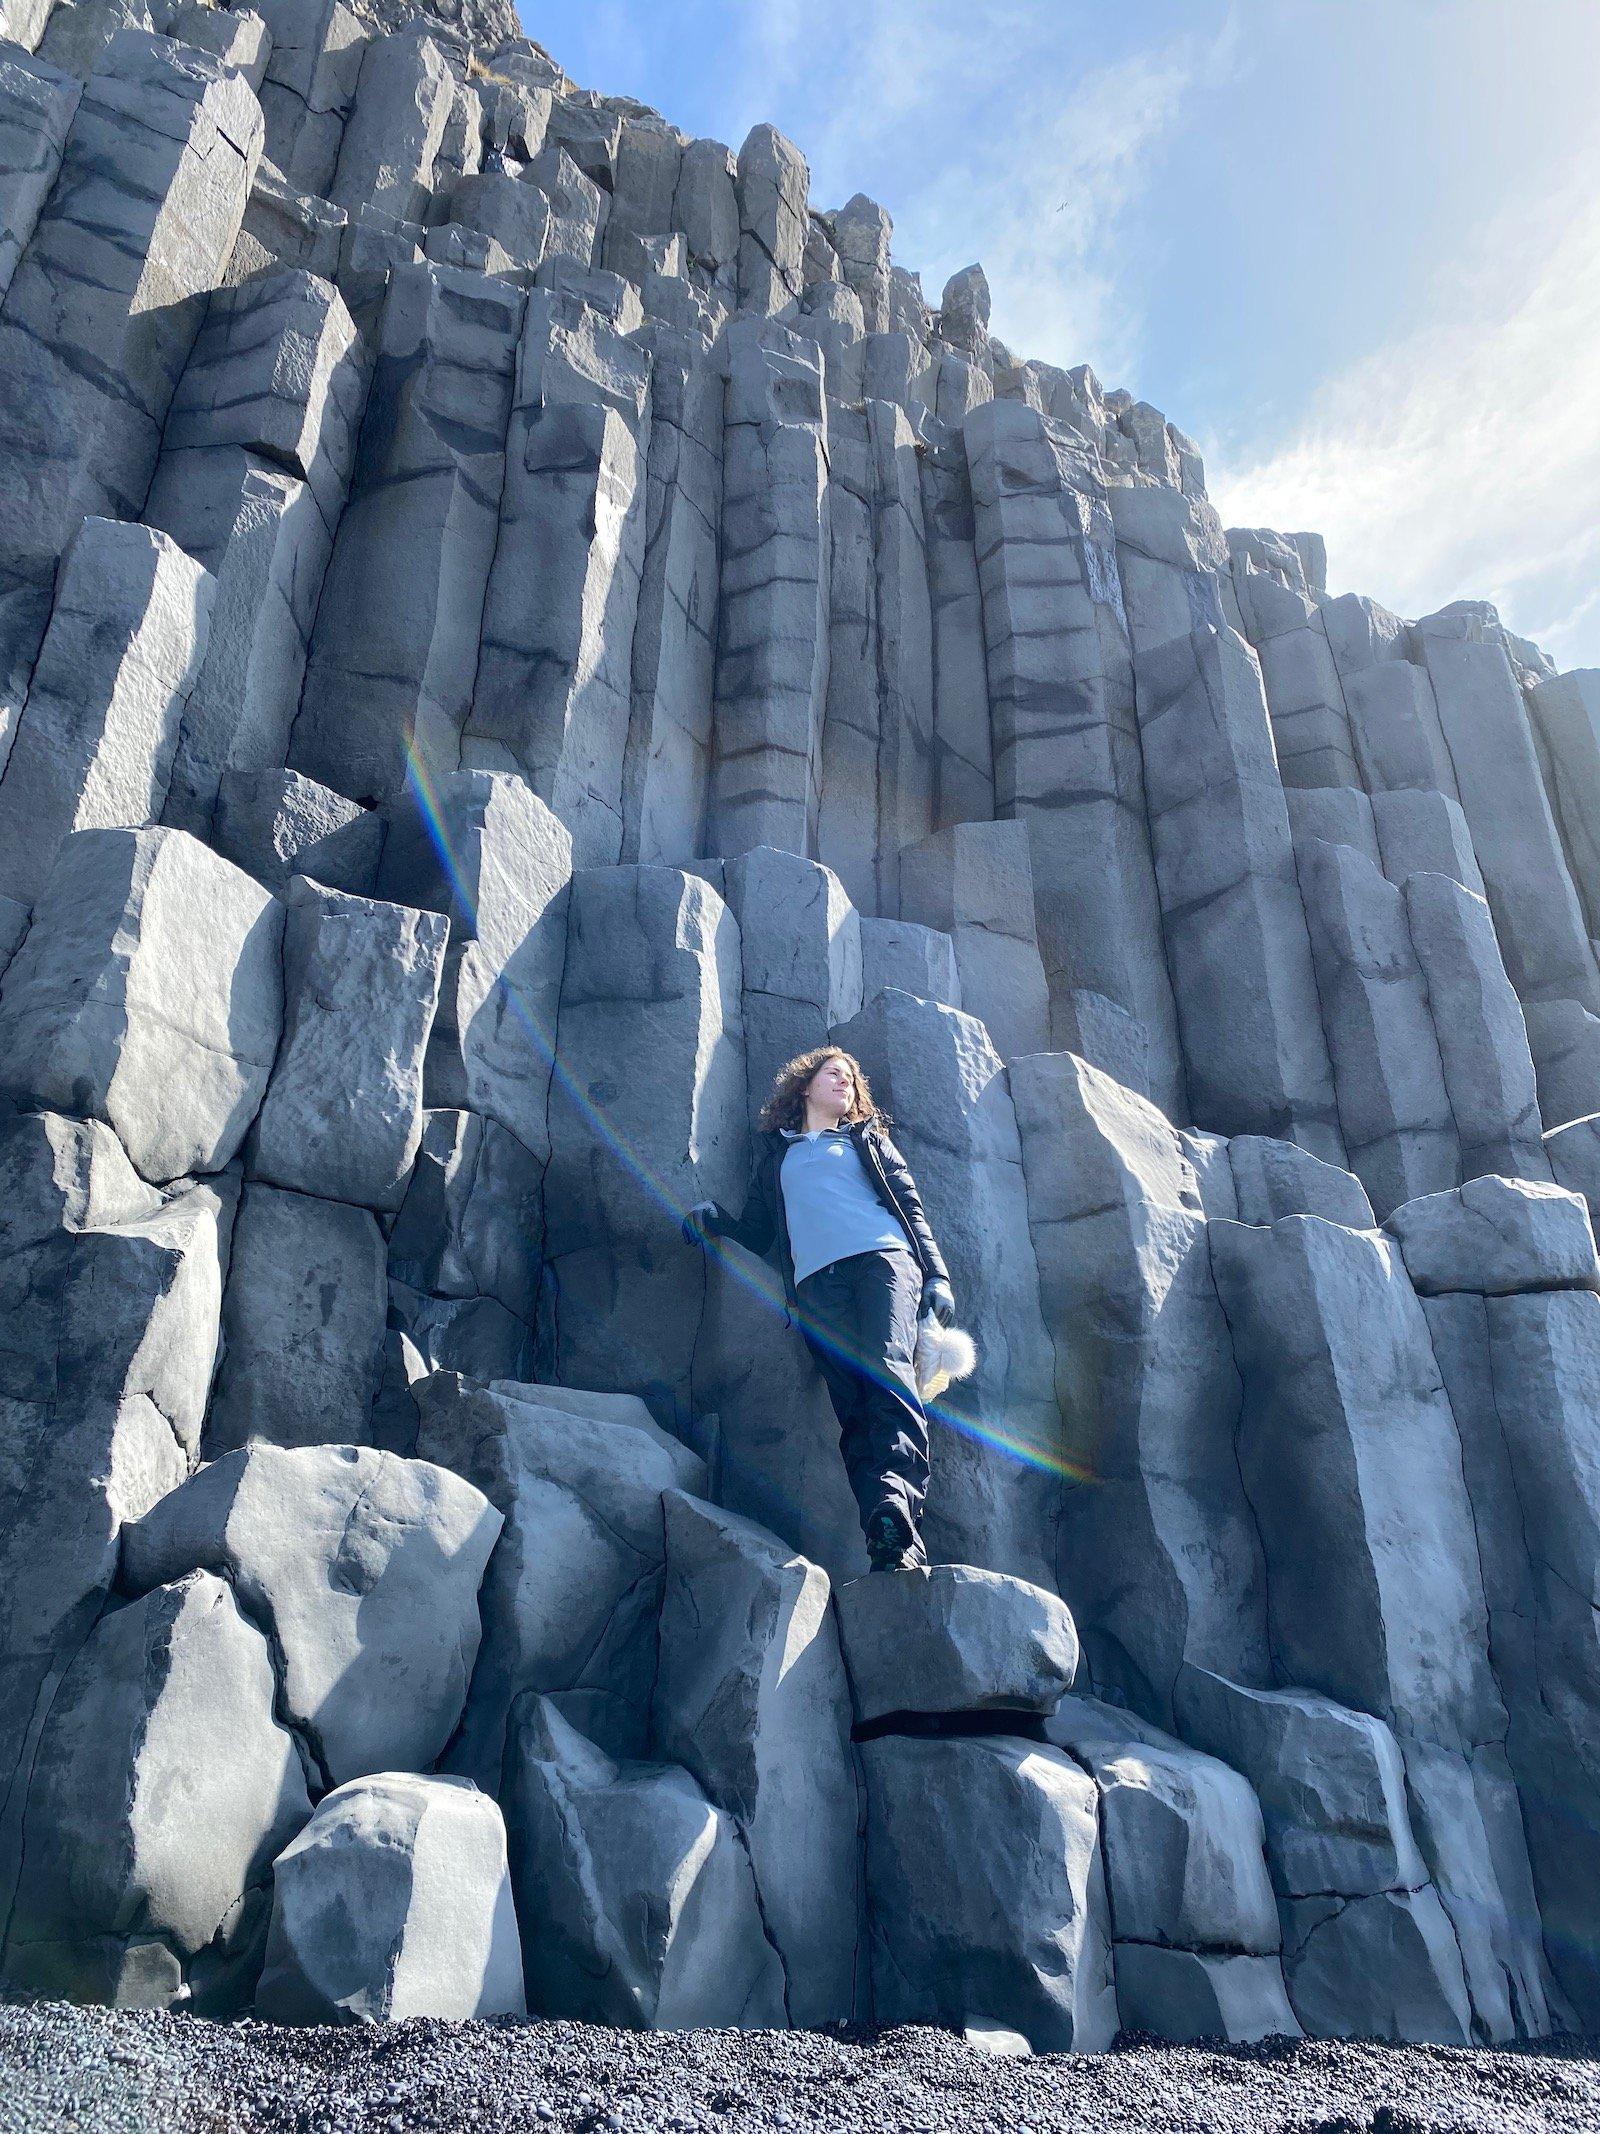 Teen girl posing on the Basalt Columns in Iceland.